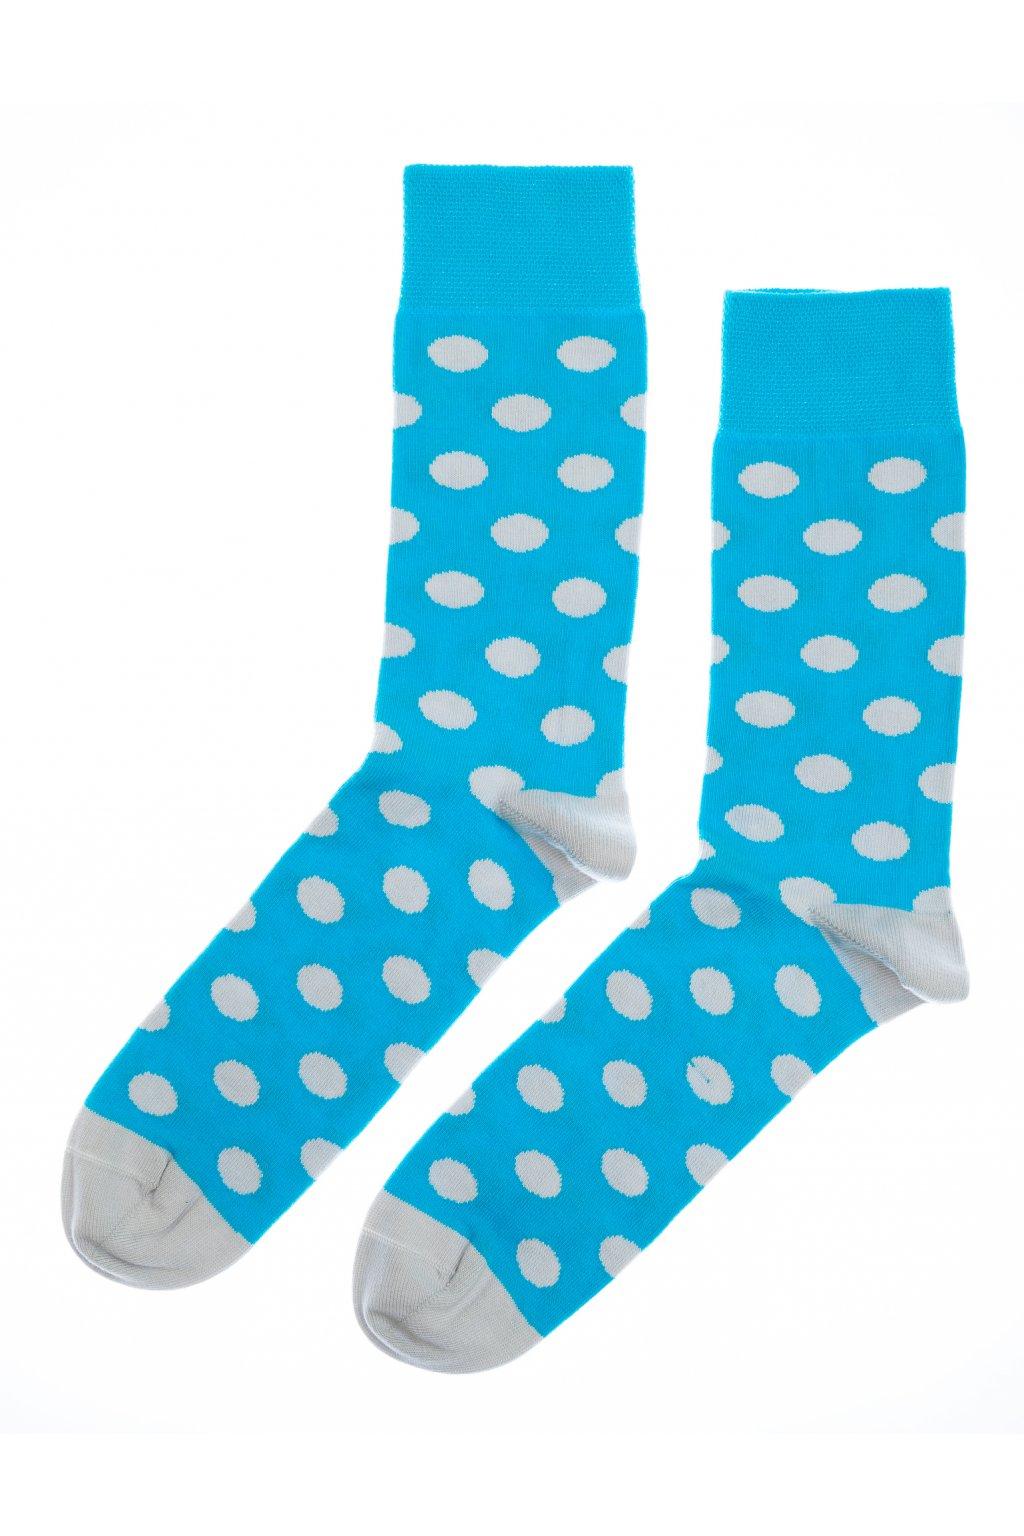 Barevné ponožky Edmund - modré puntíky